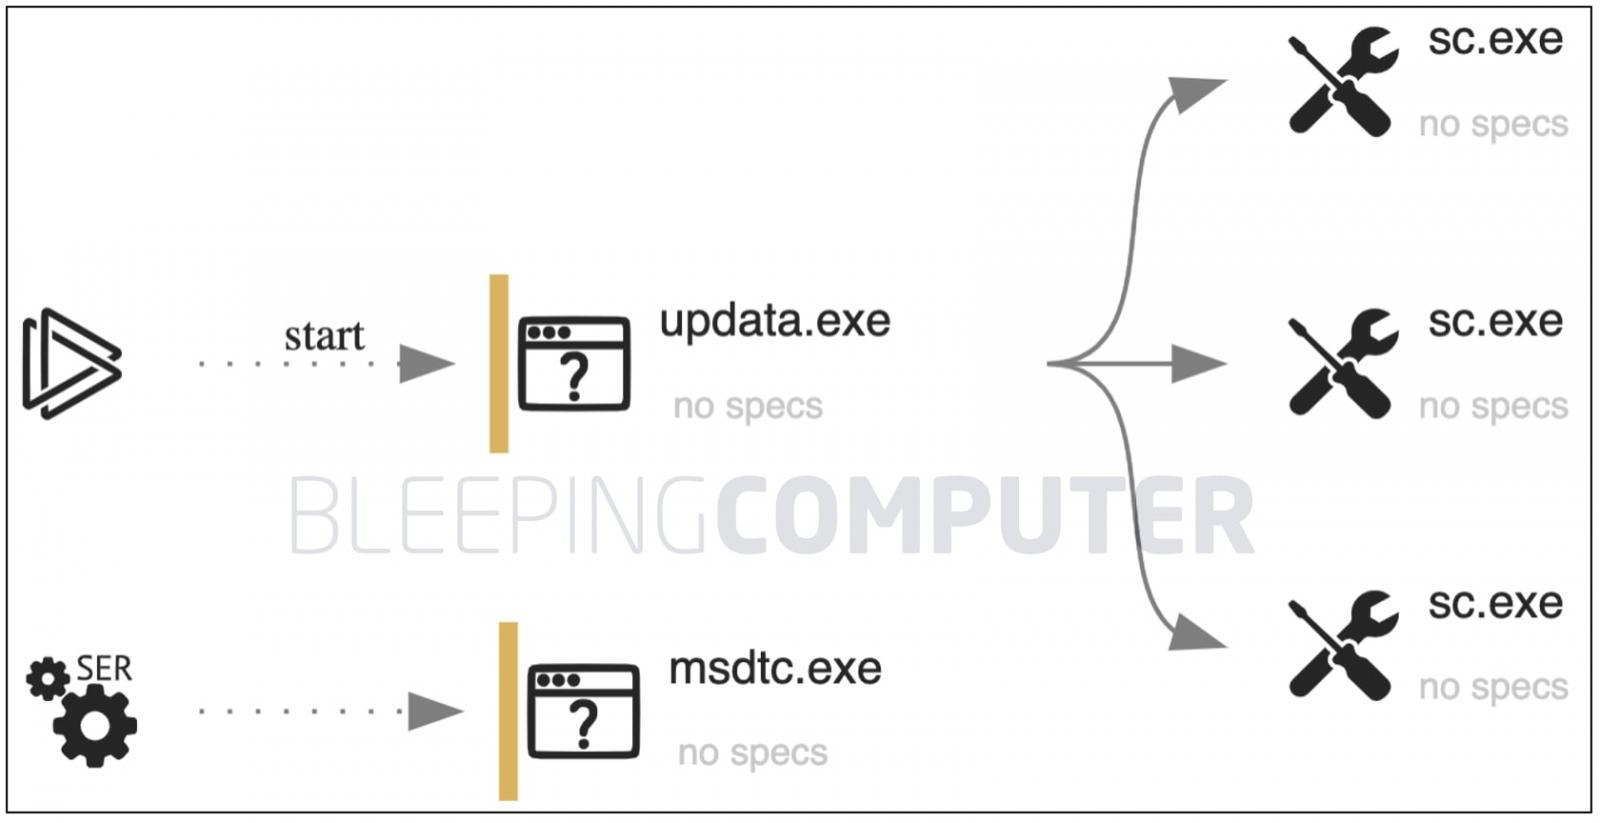 updata.exe configures msdtc